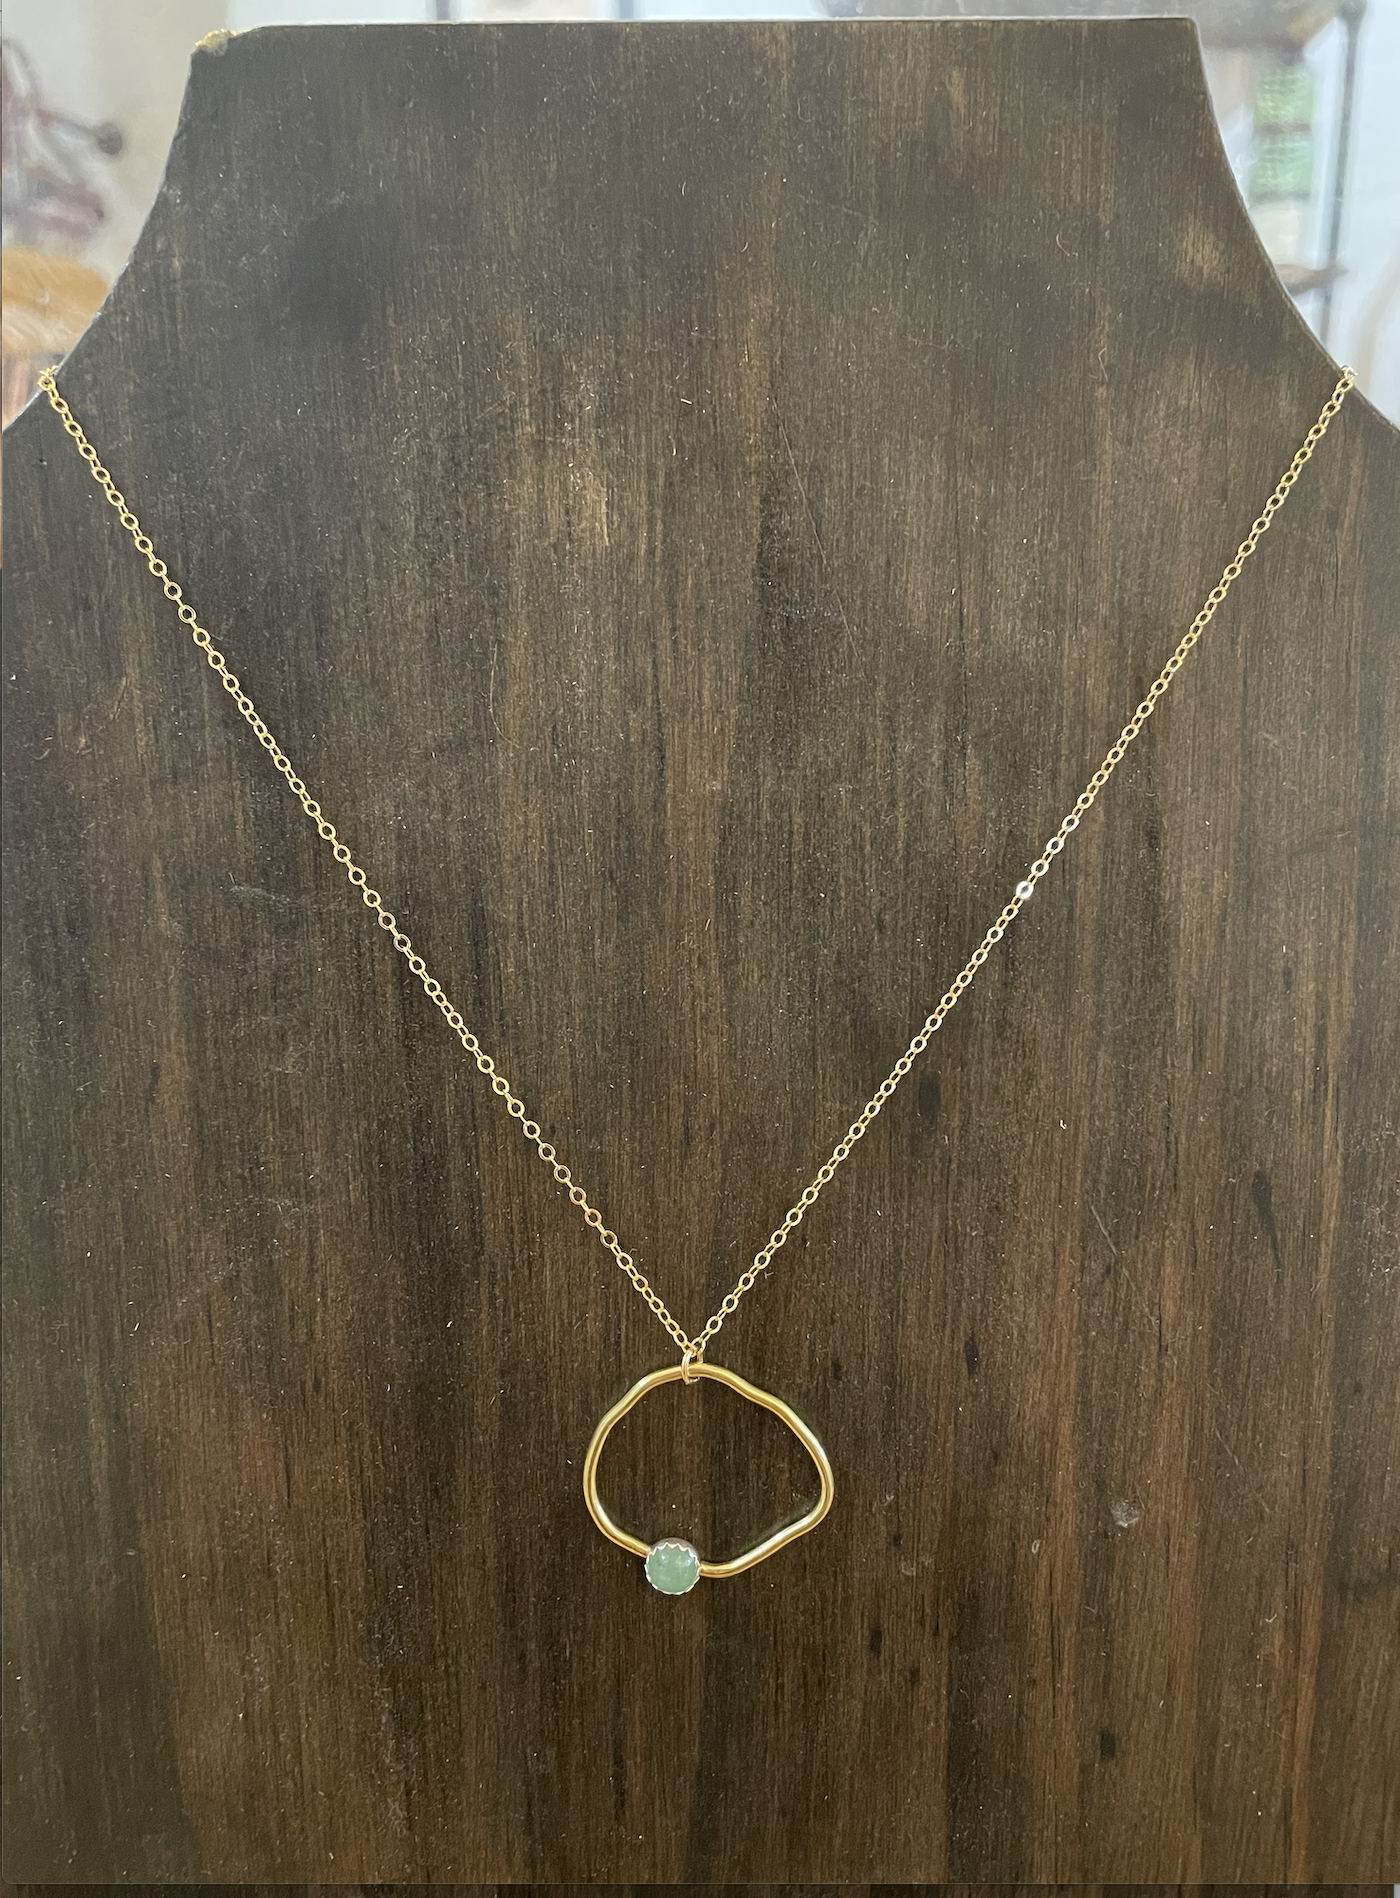 Metrix Jewelry Bella Necklace-Adventurine